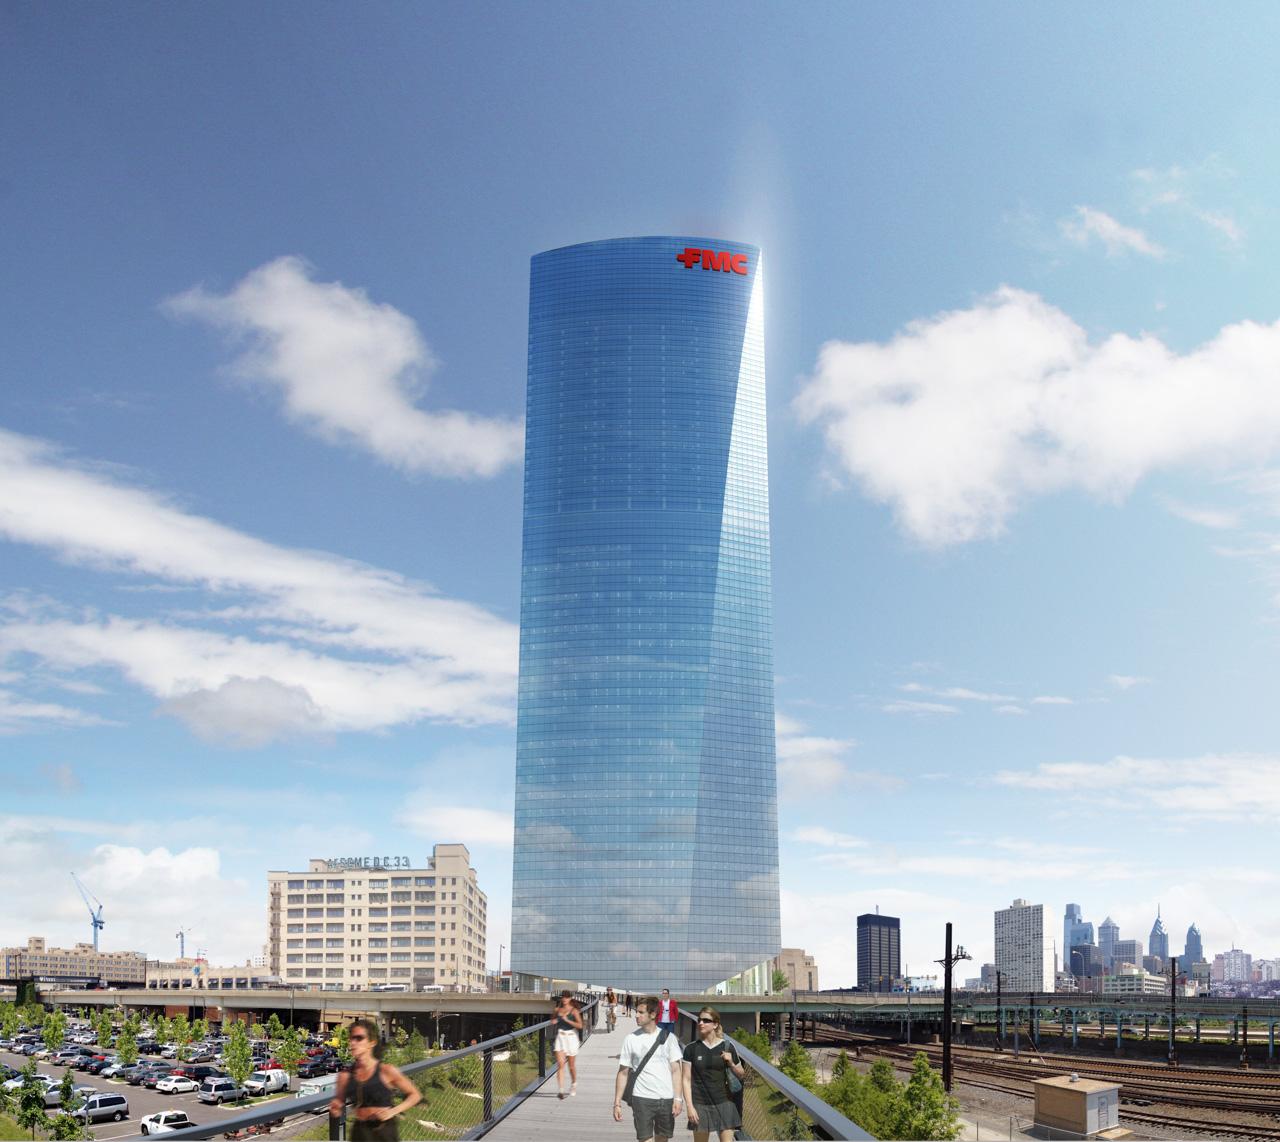 Philadelphia Fmc Tower Cira Centre South 736 Ft 49 Floors Skyscraperpage Forum